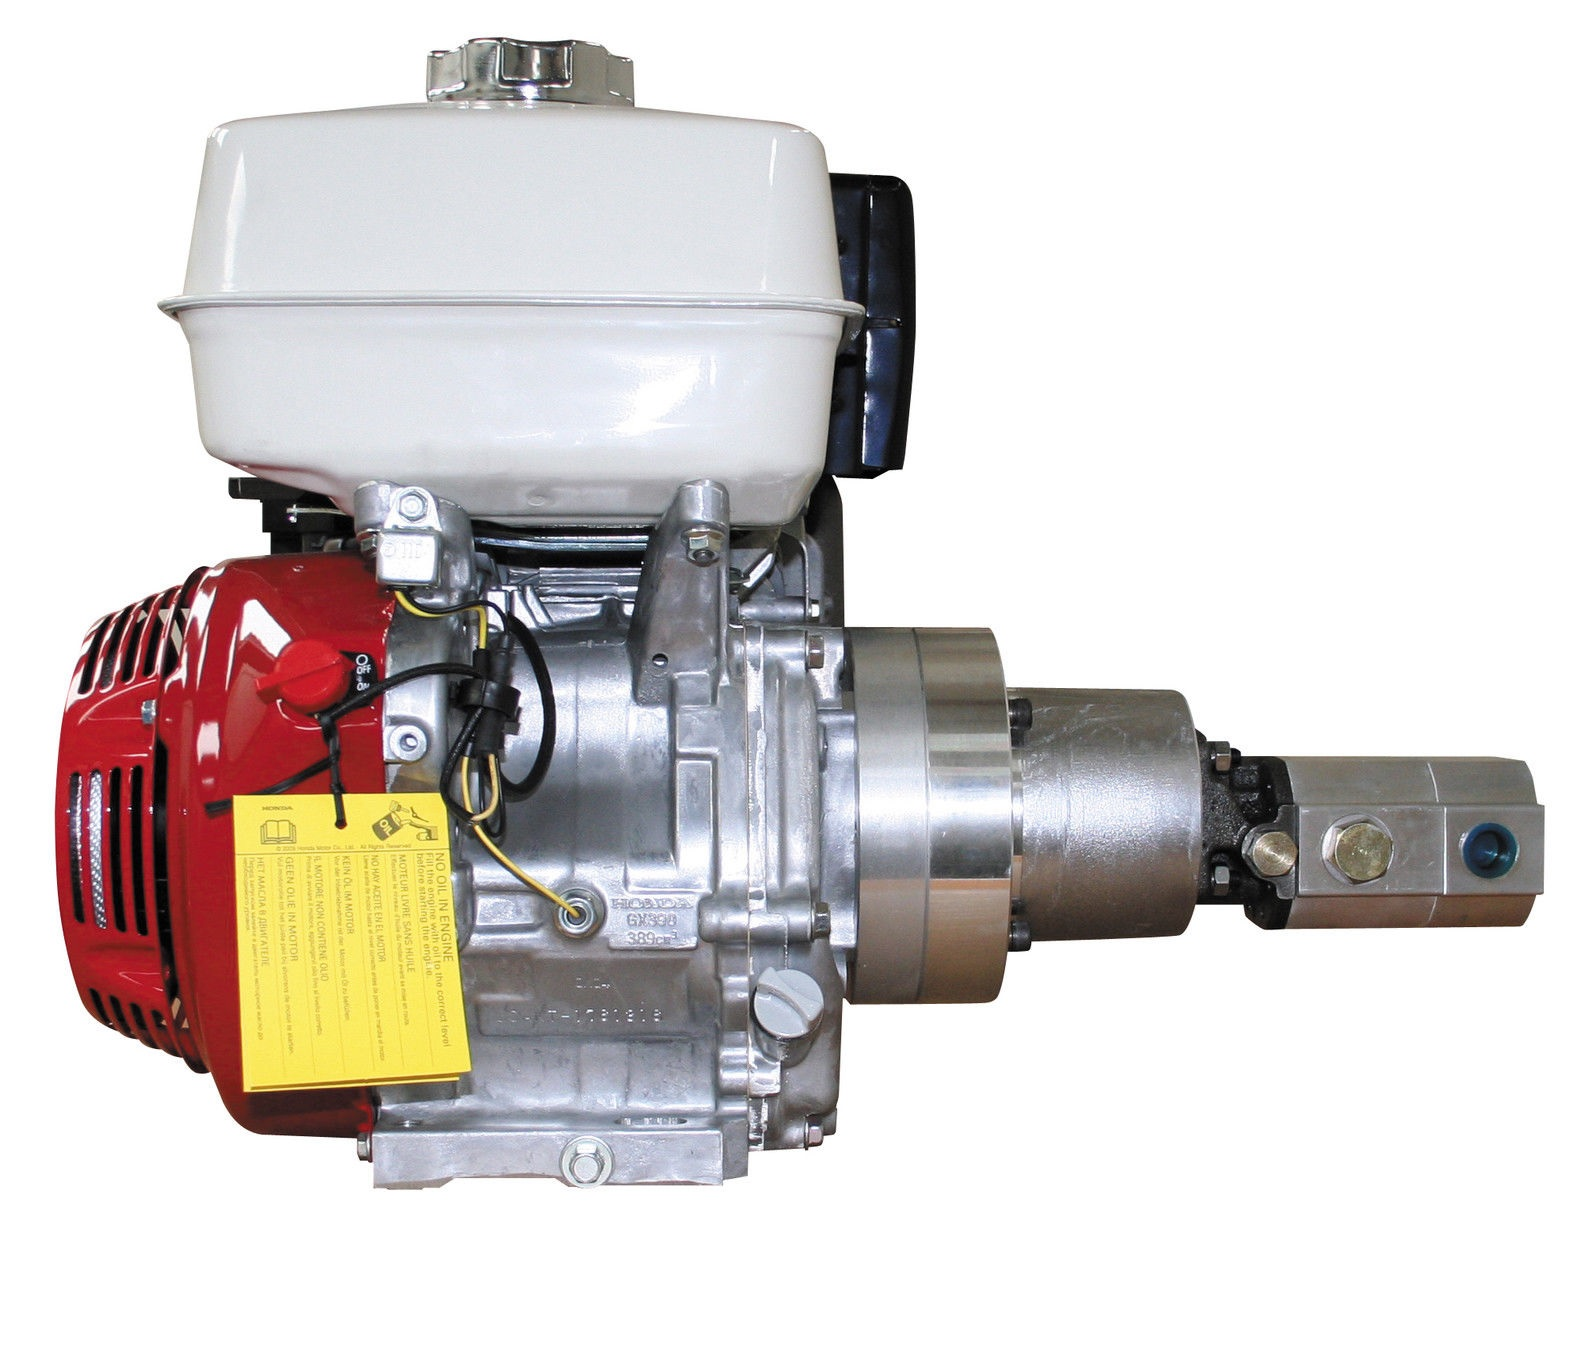 Quot Honda Petrol Engine Hydraulic Pump Set 13hp 24 L Min